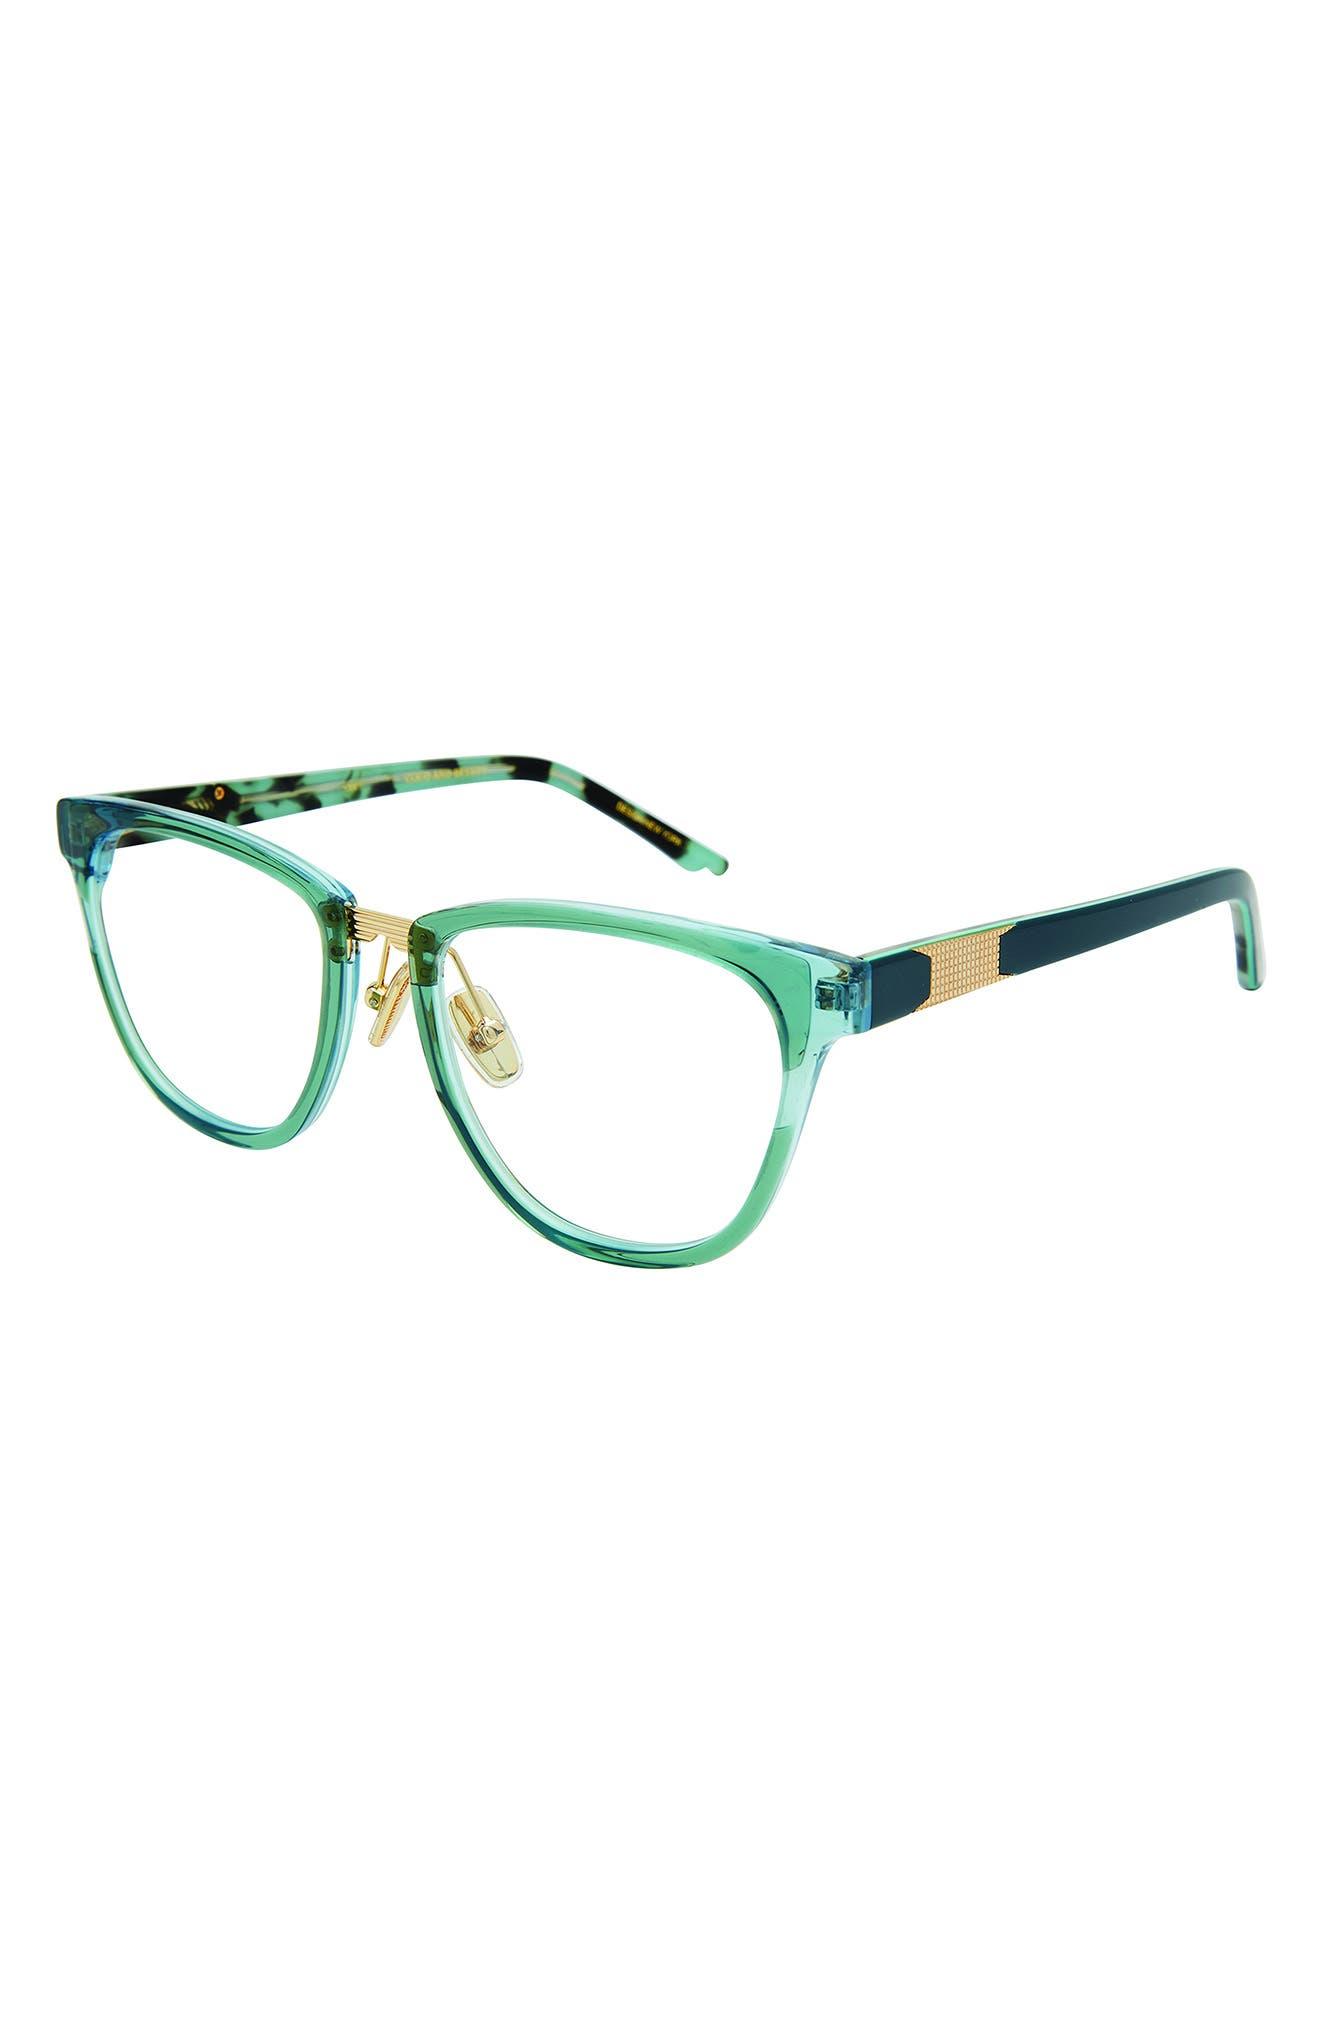 Intention 52mm Oval Blue Light Filtering Glasses